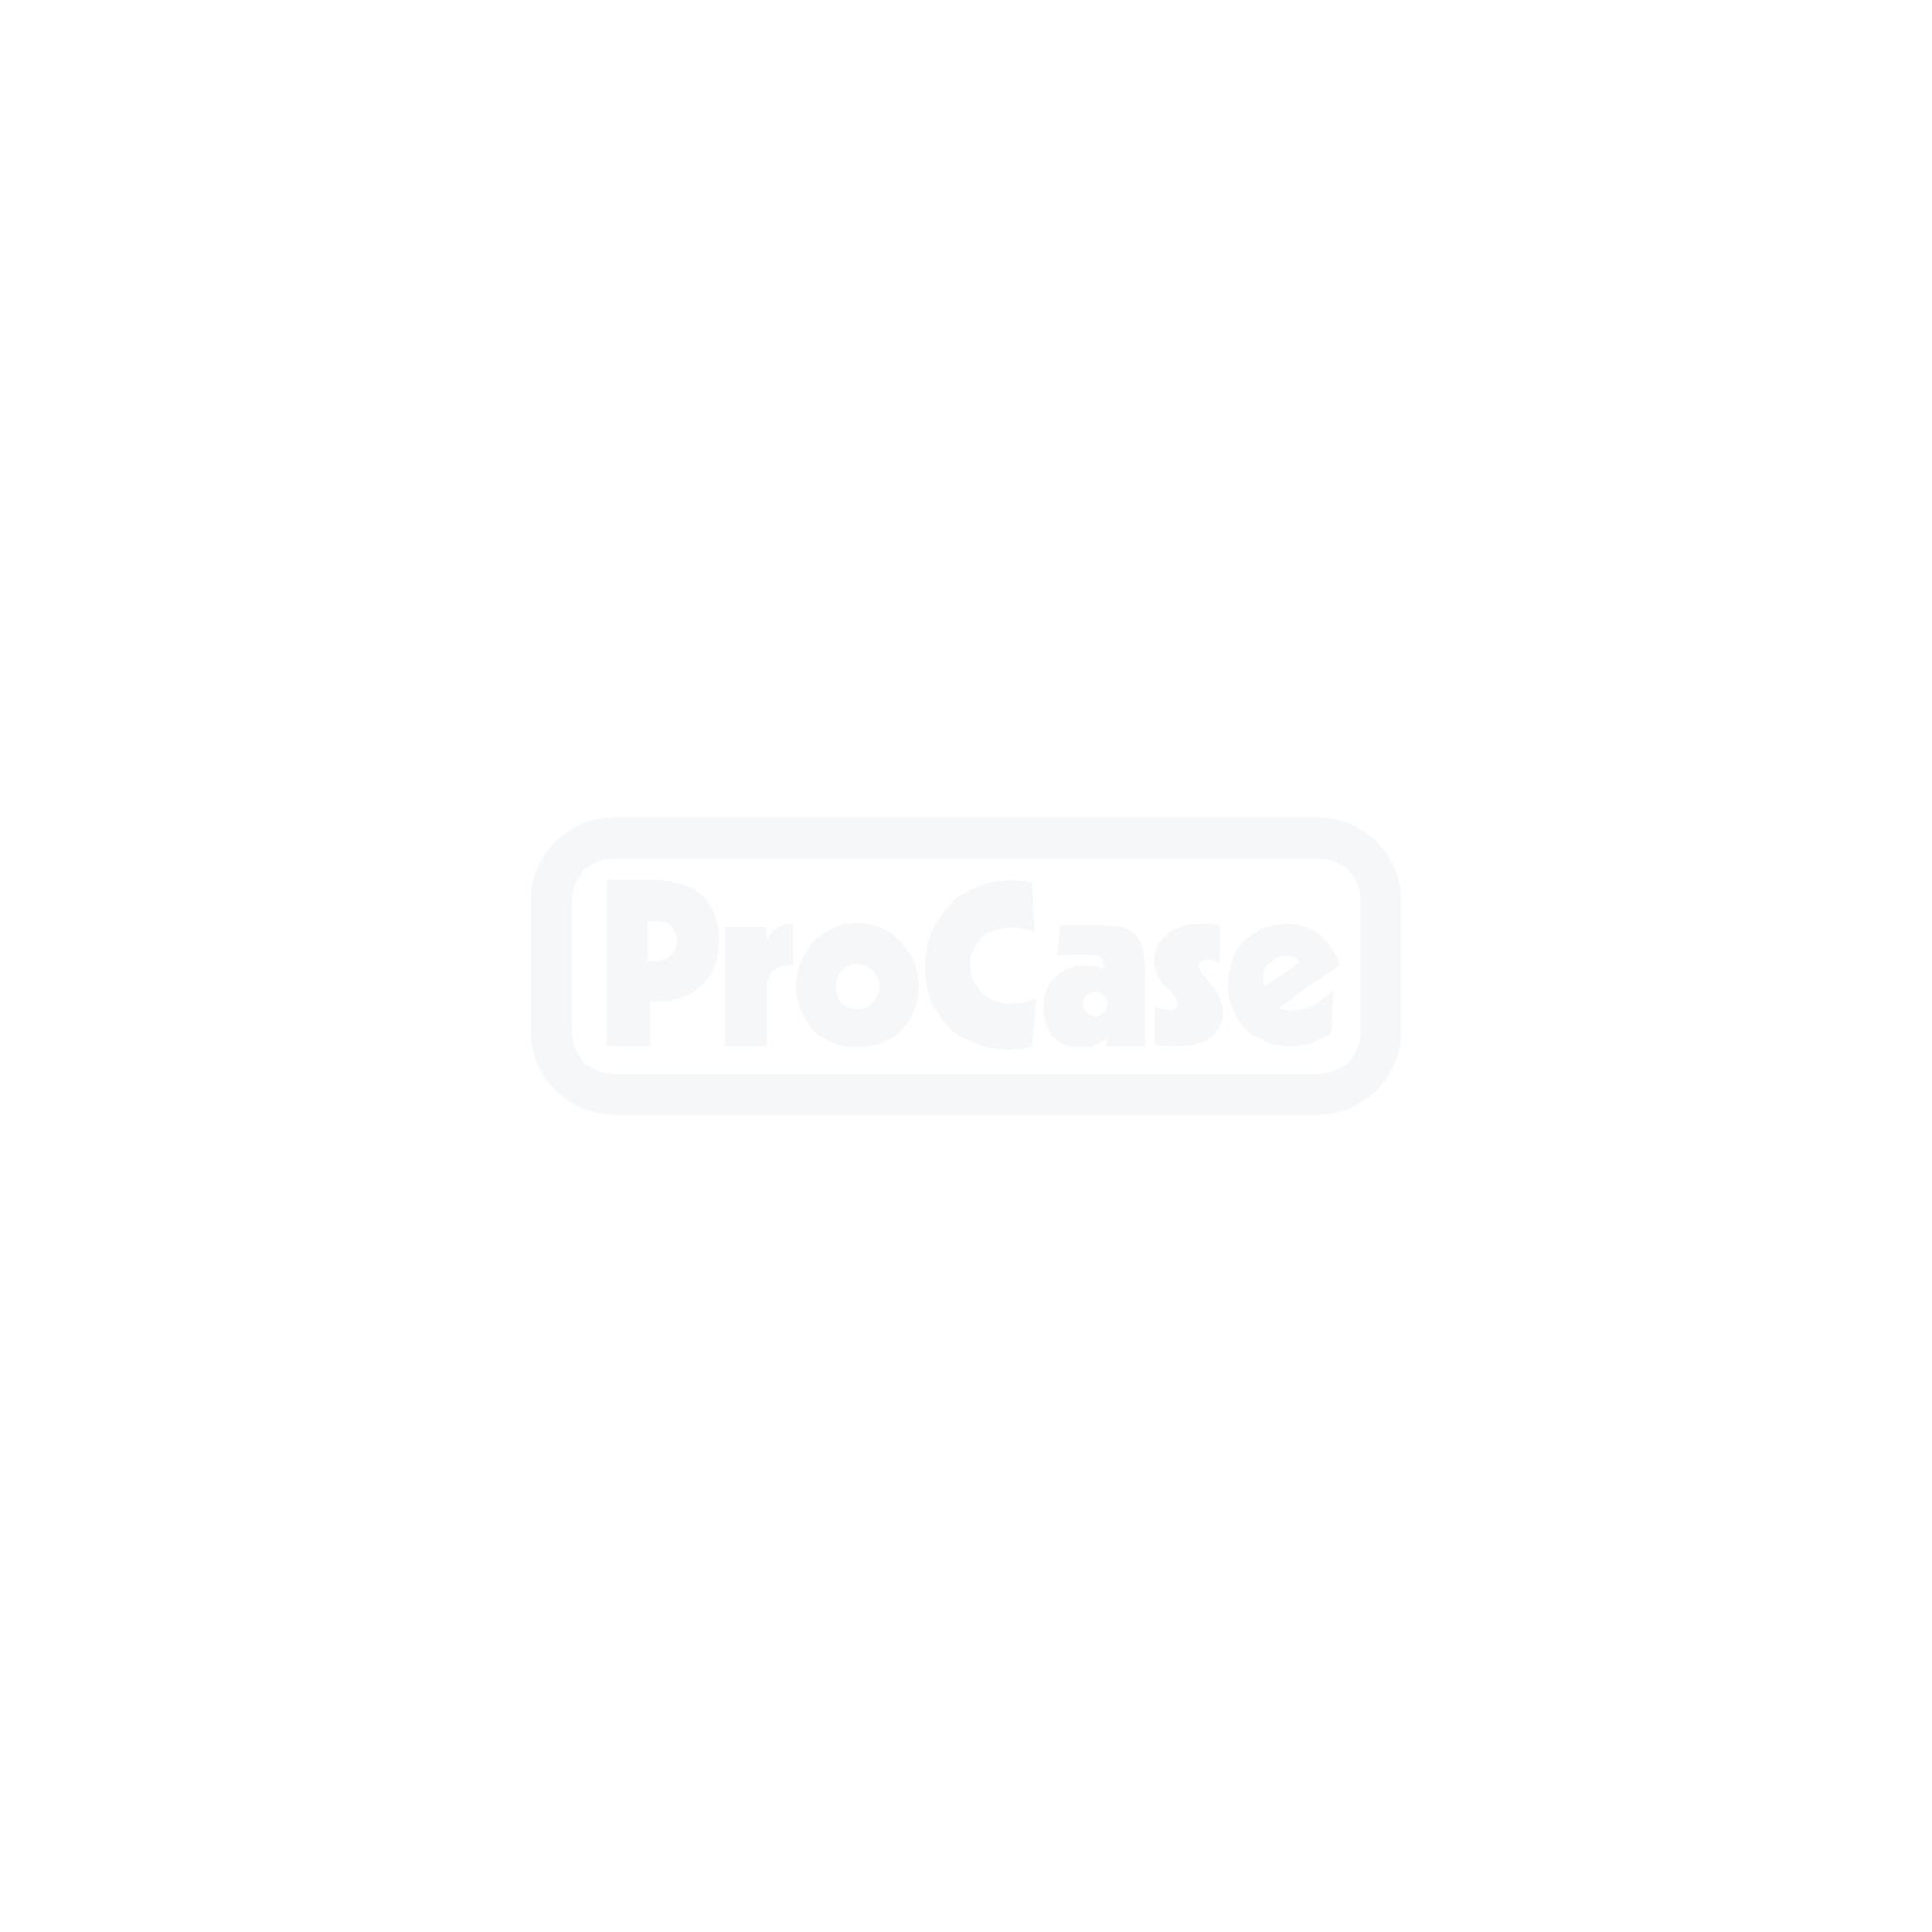 Flightcase für 2 d&b audiotechnik Y7P/Y10P 3